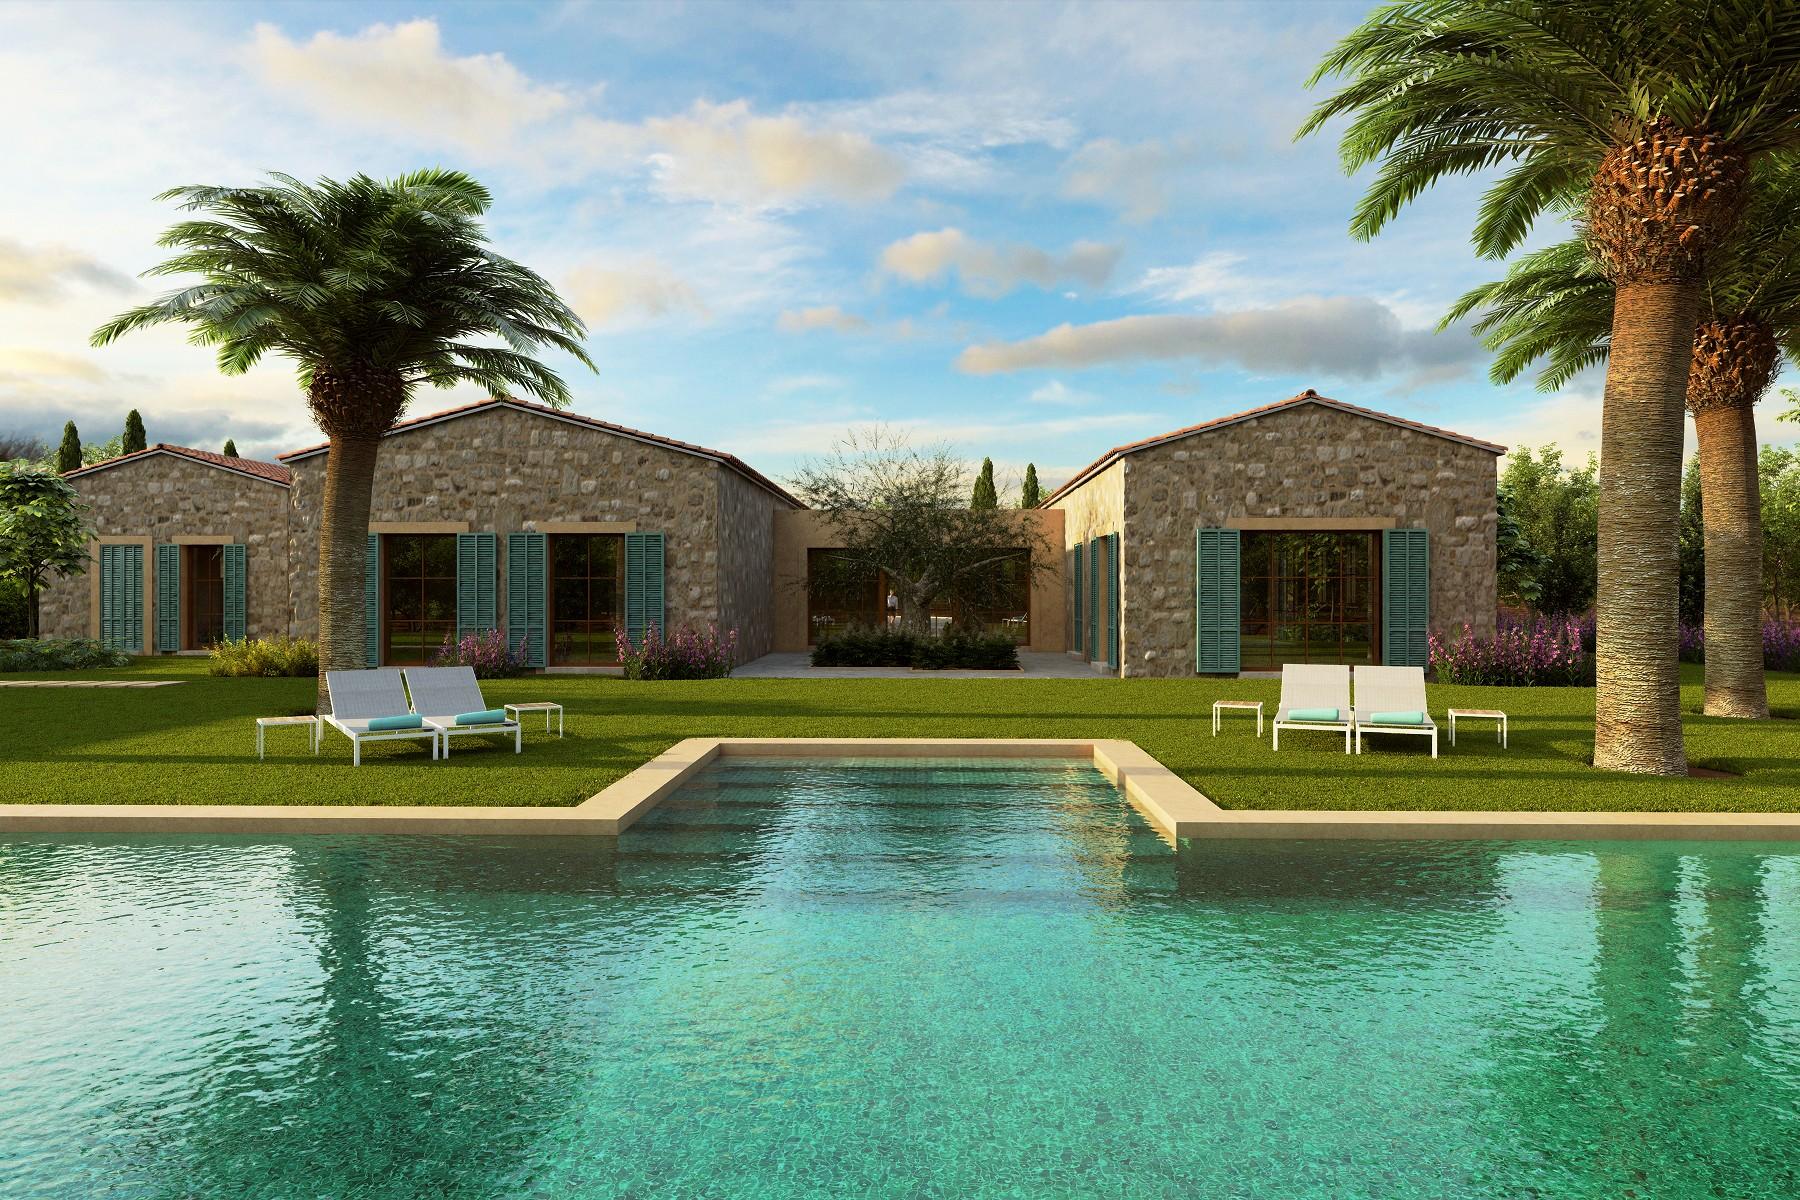 Einfamilienhaus für Verkauf beim Finca in Santa Maria del Cami Santa Maria, Mallorca, 07001 Spanien